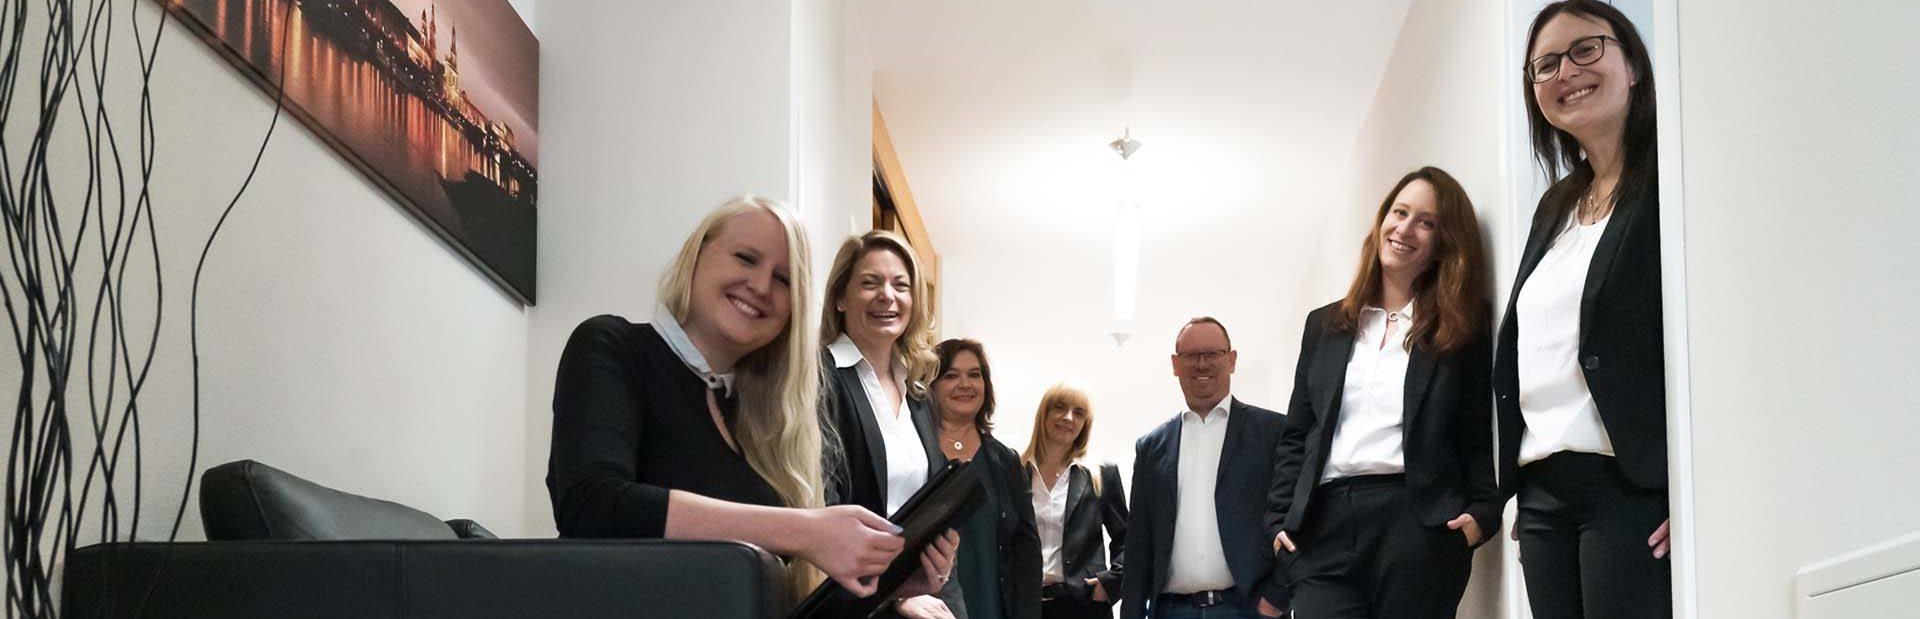 Seeliger & Co. GmbH - Über uns